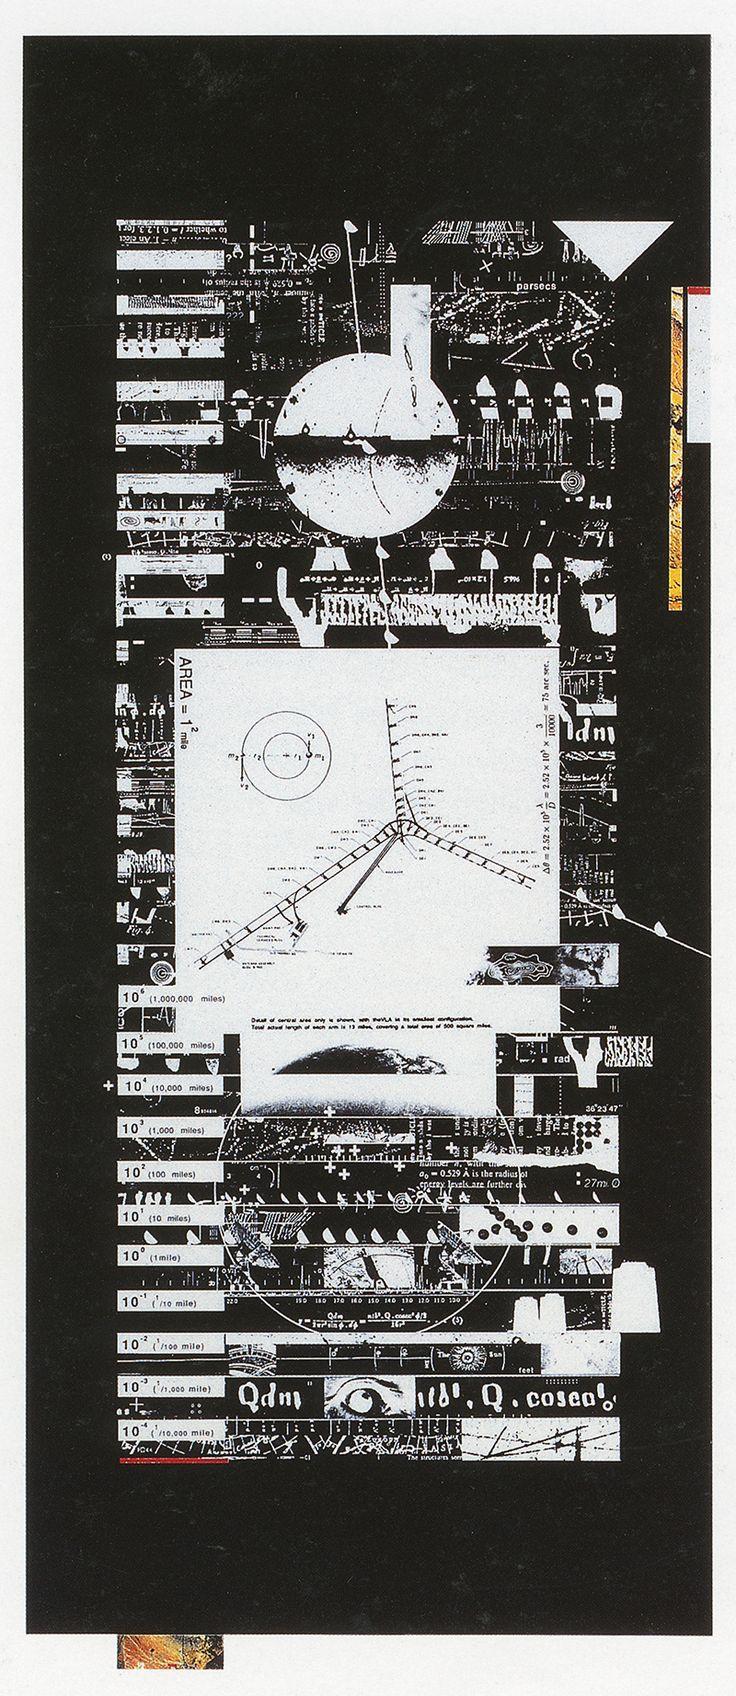 James Corner. Taking Measure Across the American Landscape. Yale University Press, New Haven 1995